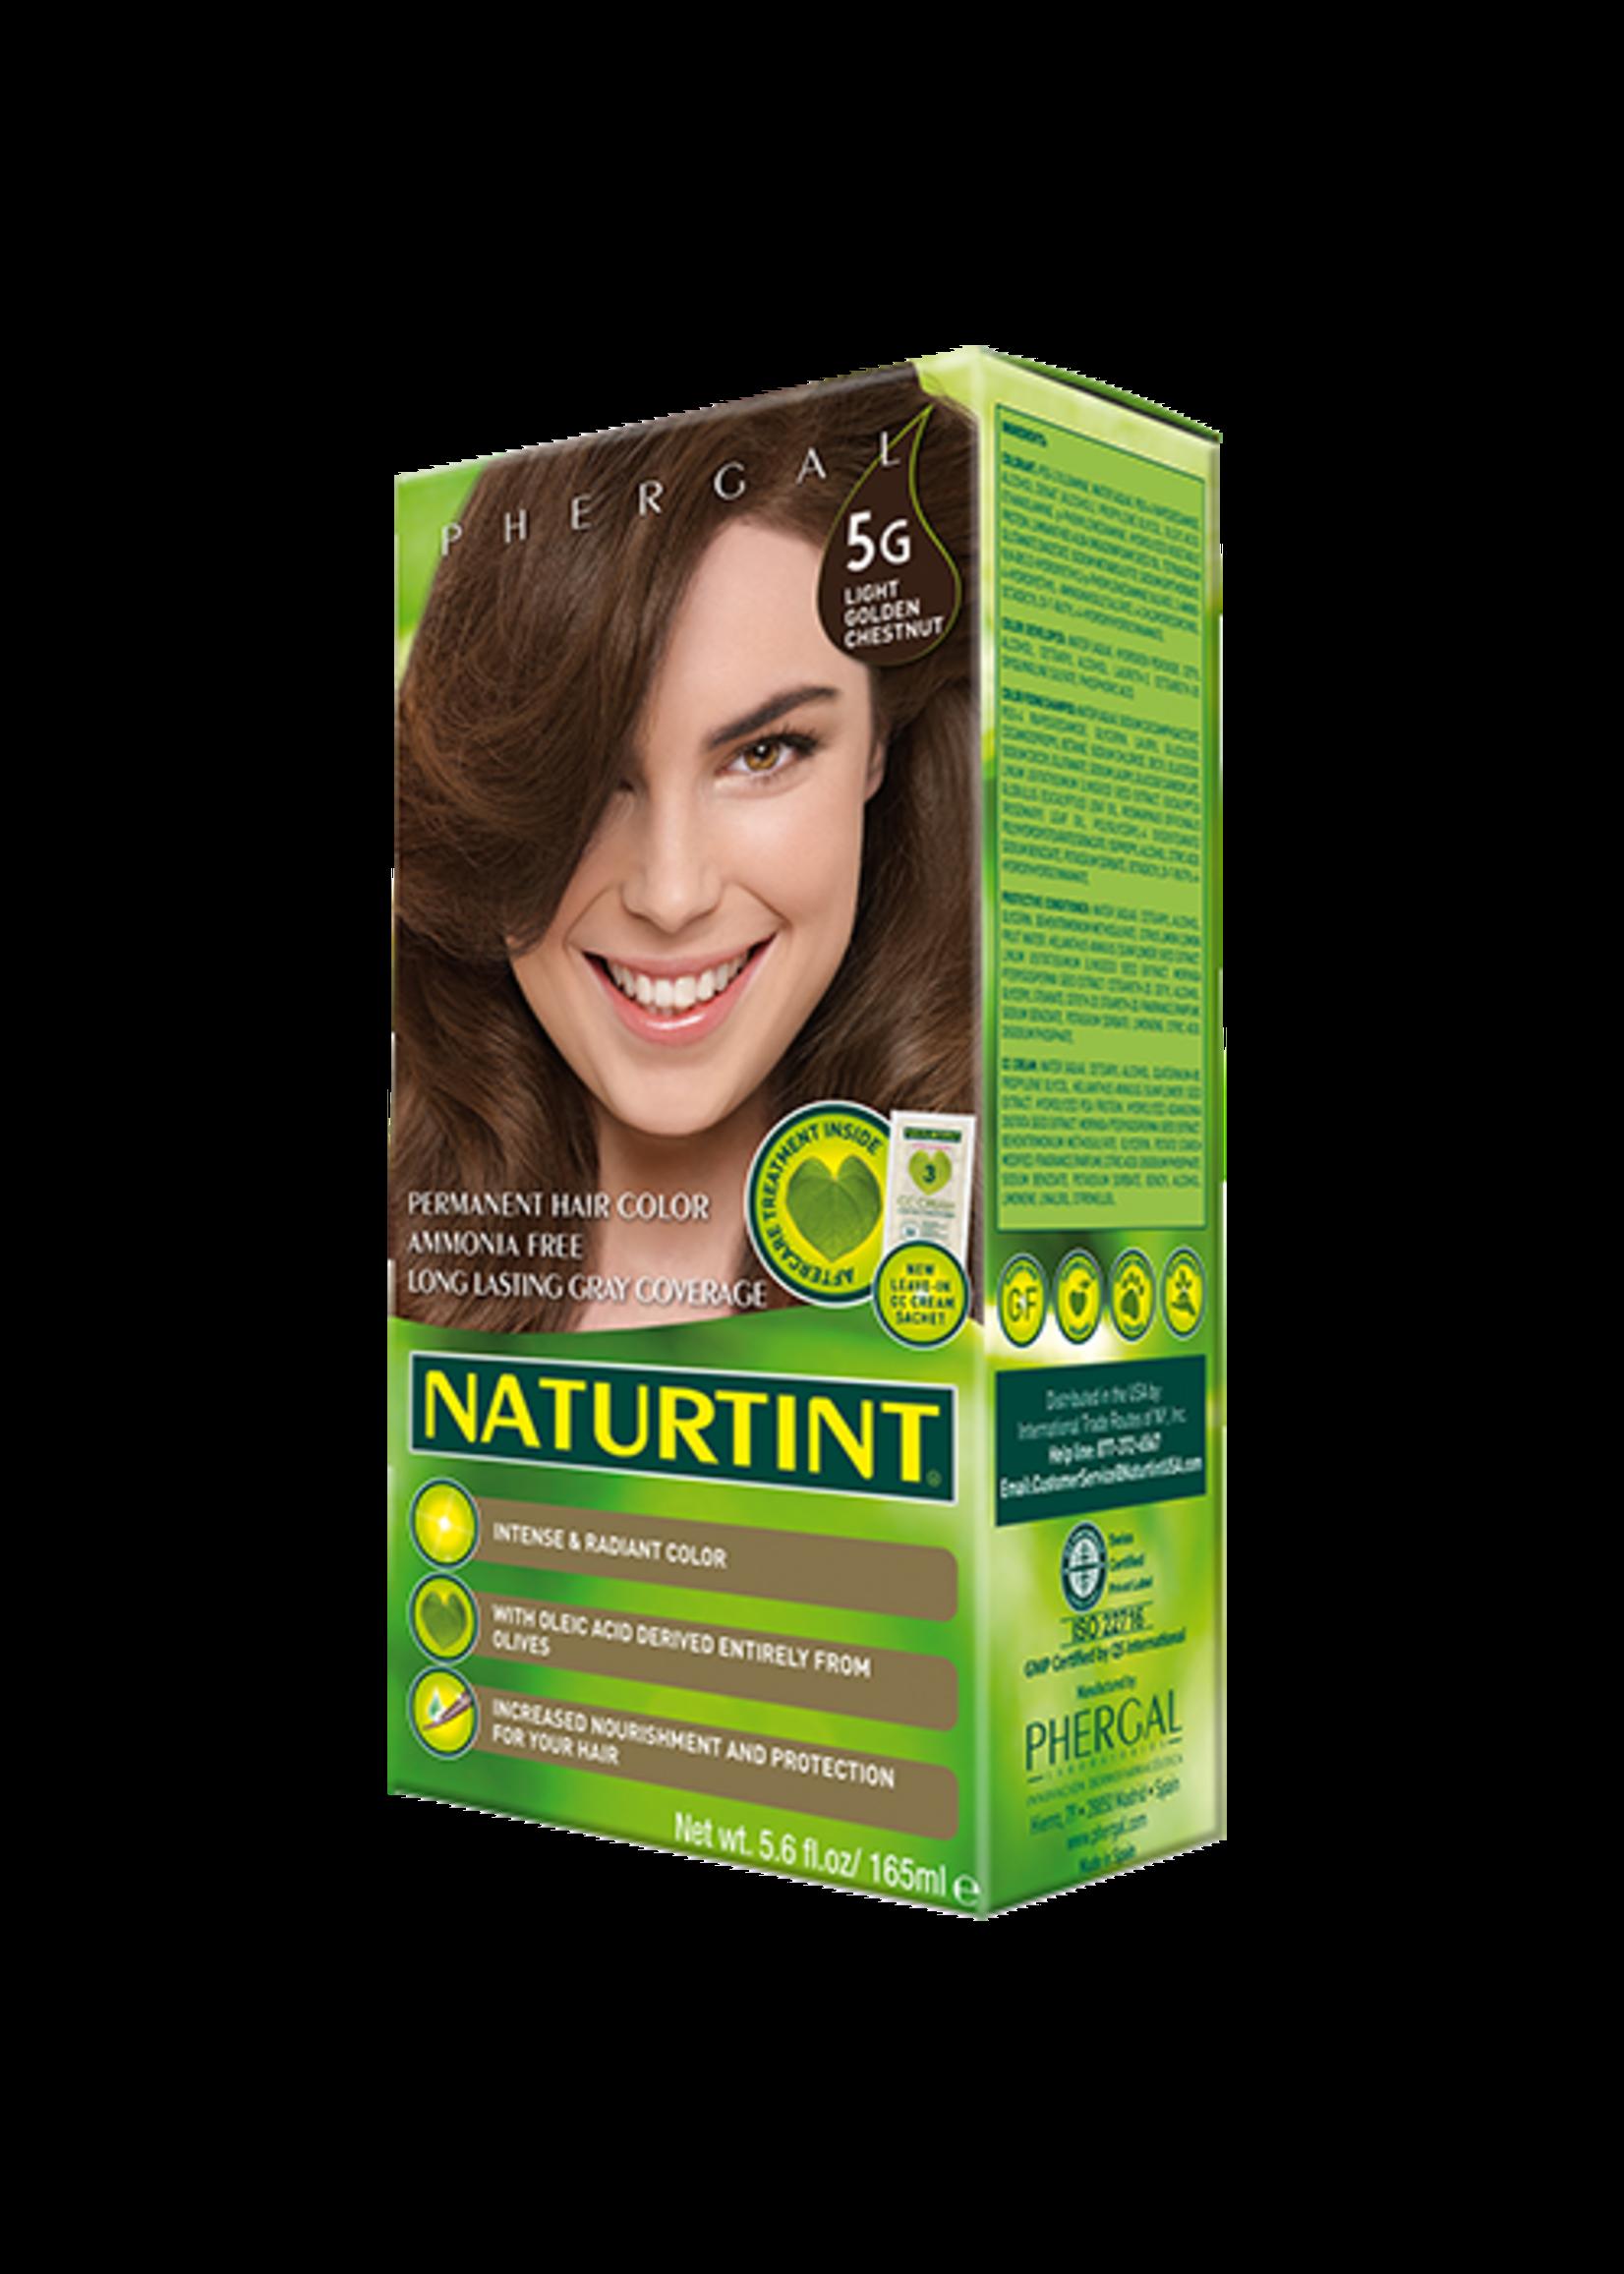 Naturtint 5G (Light Golden Chestnut)